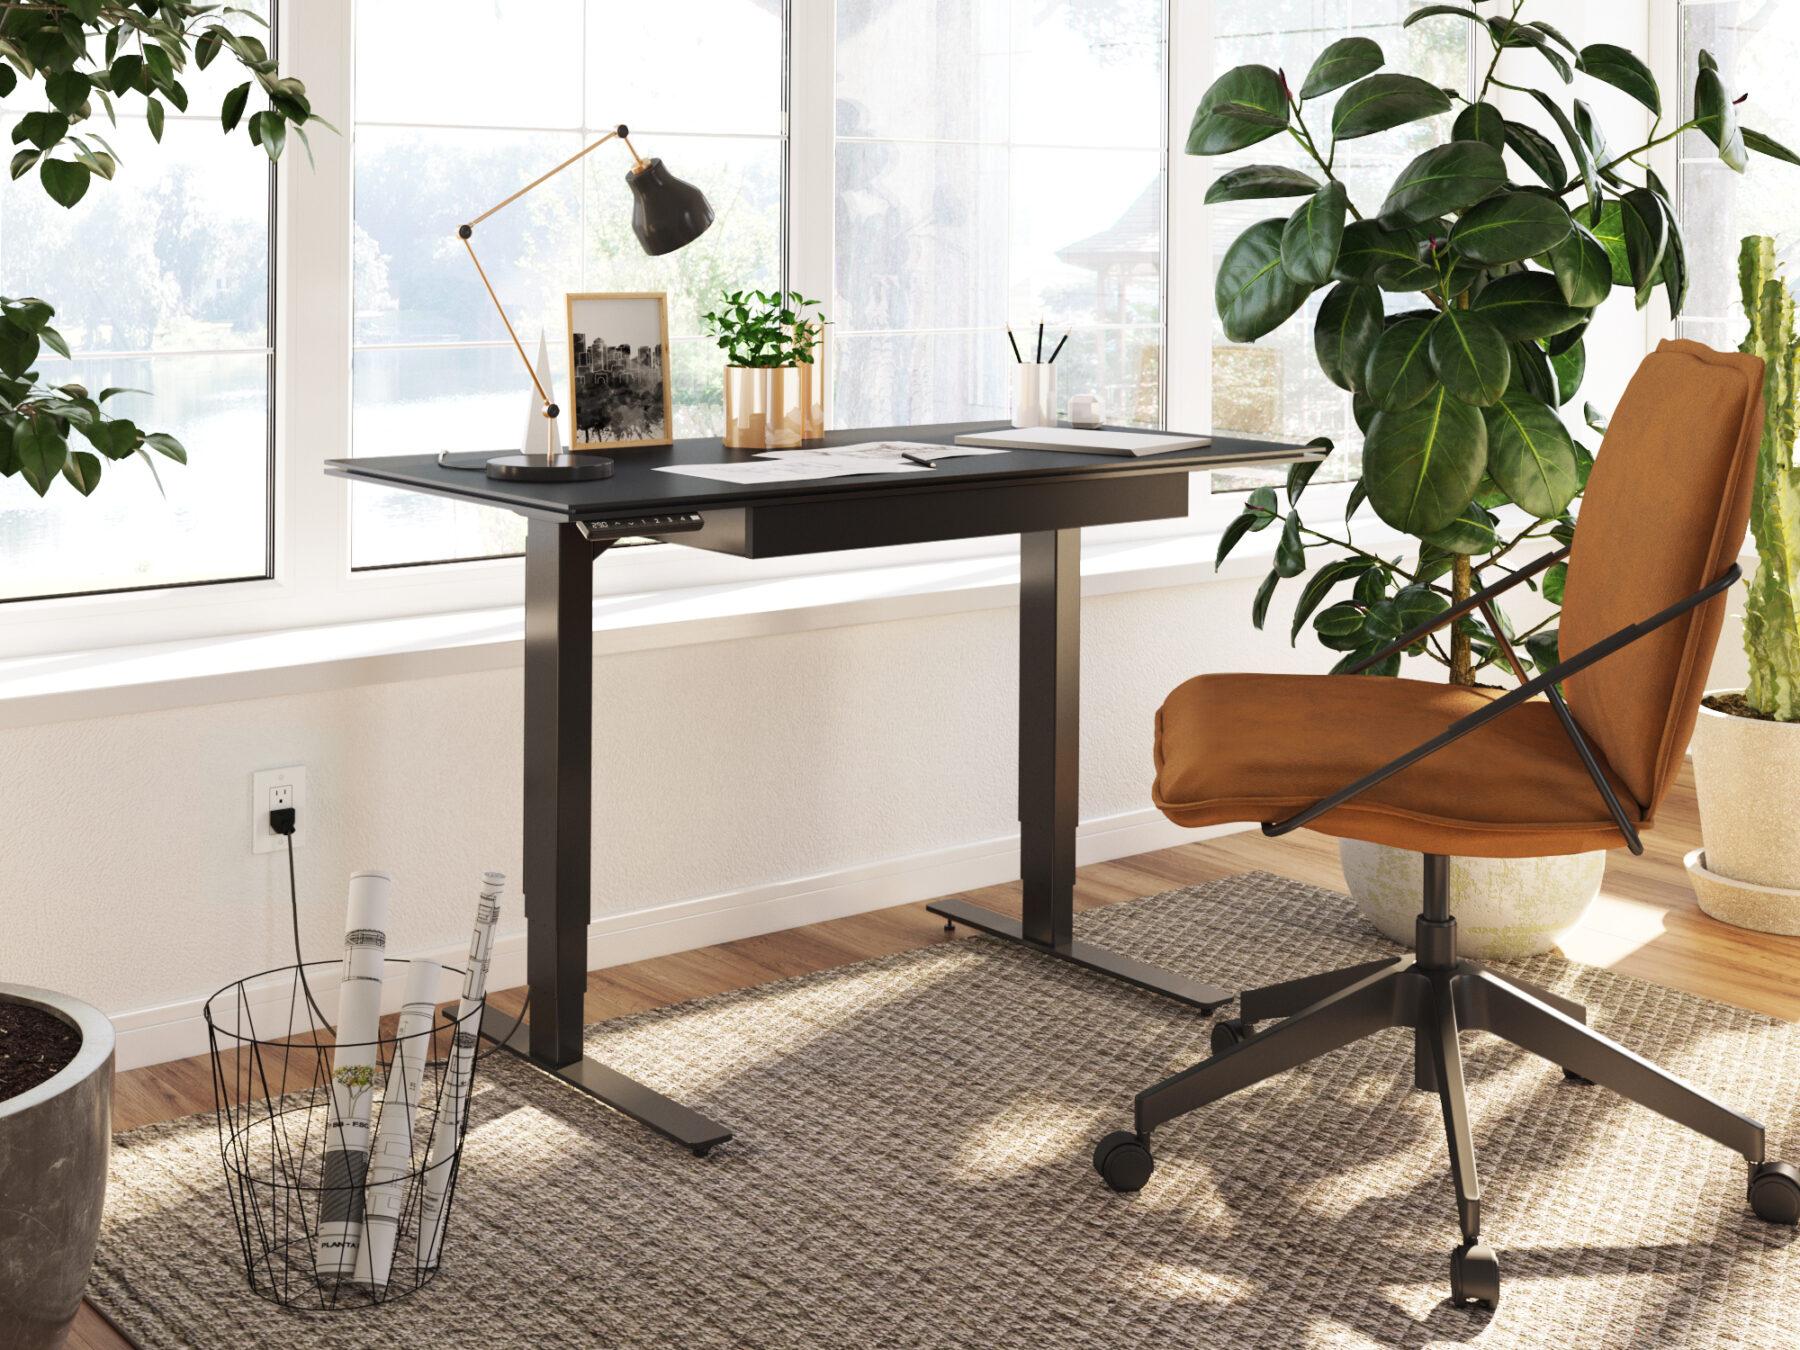 stance-lift-desk-6650-BLK-BDI-height-adjustable-desk-LS2A